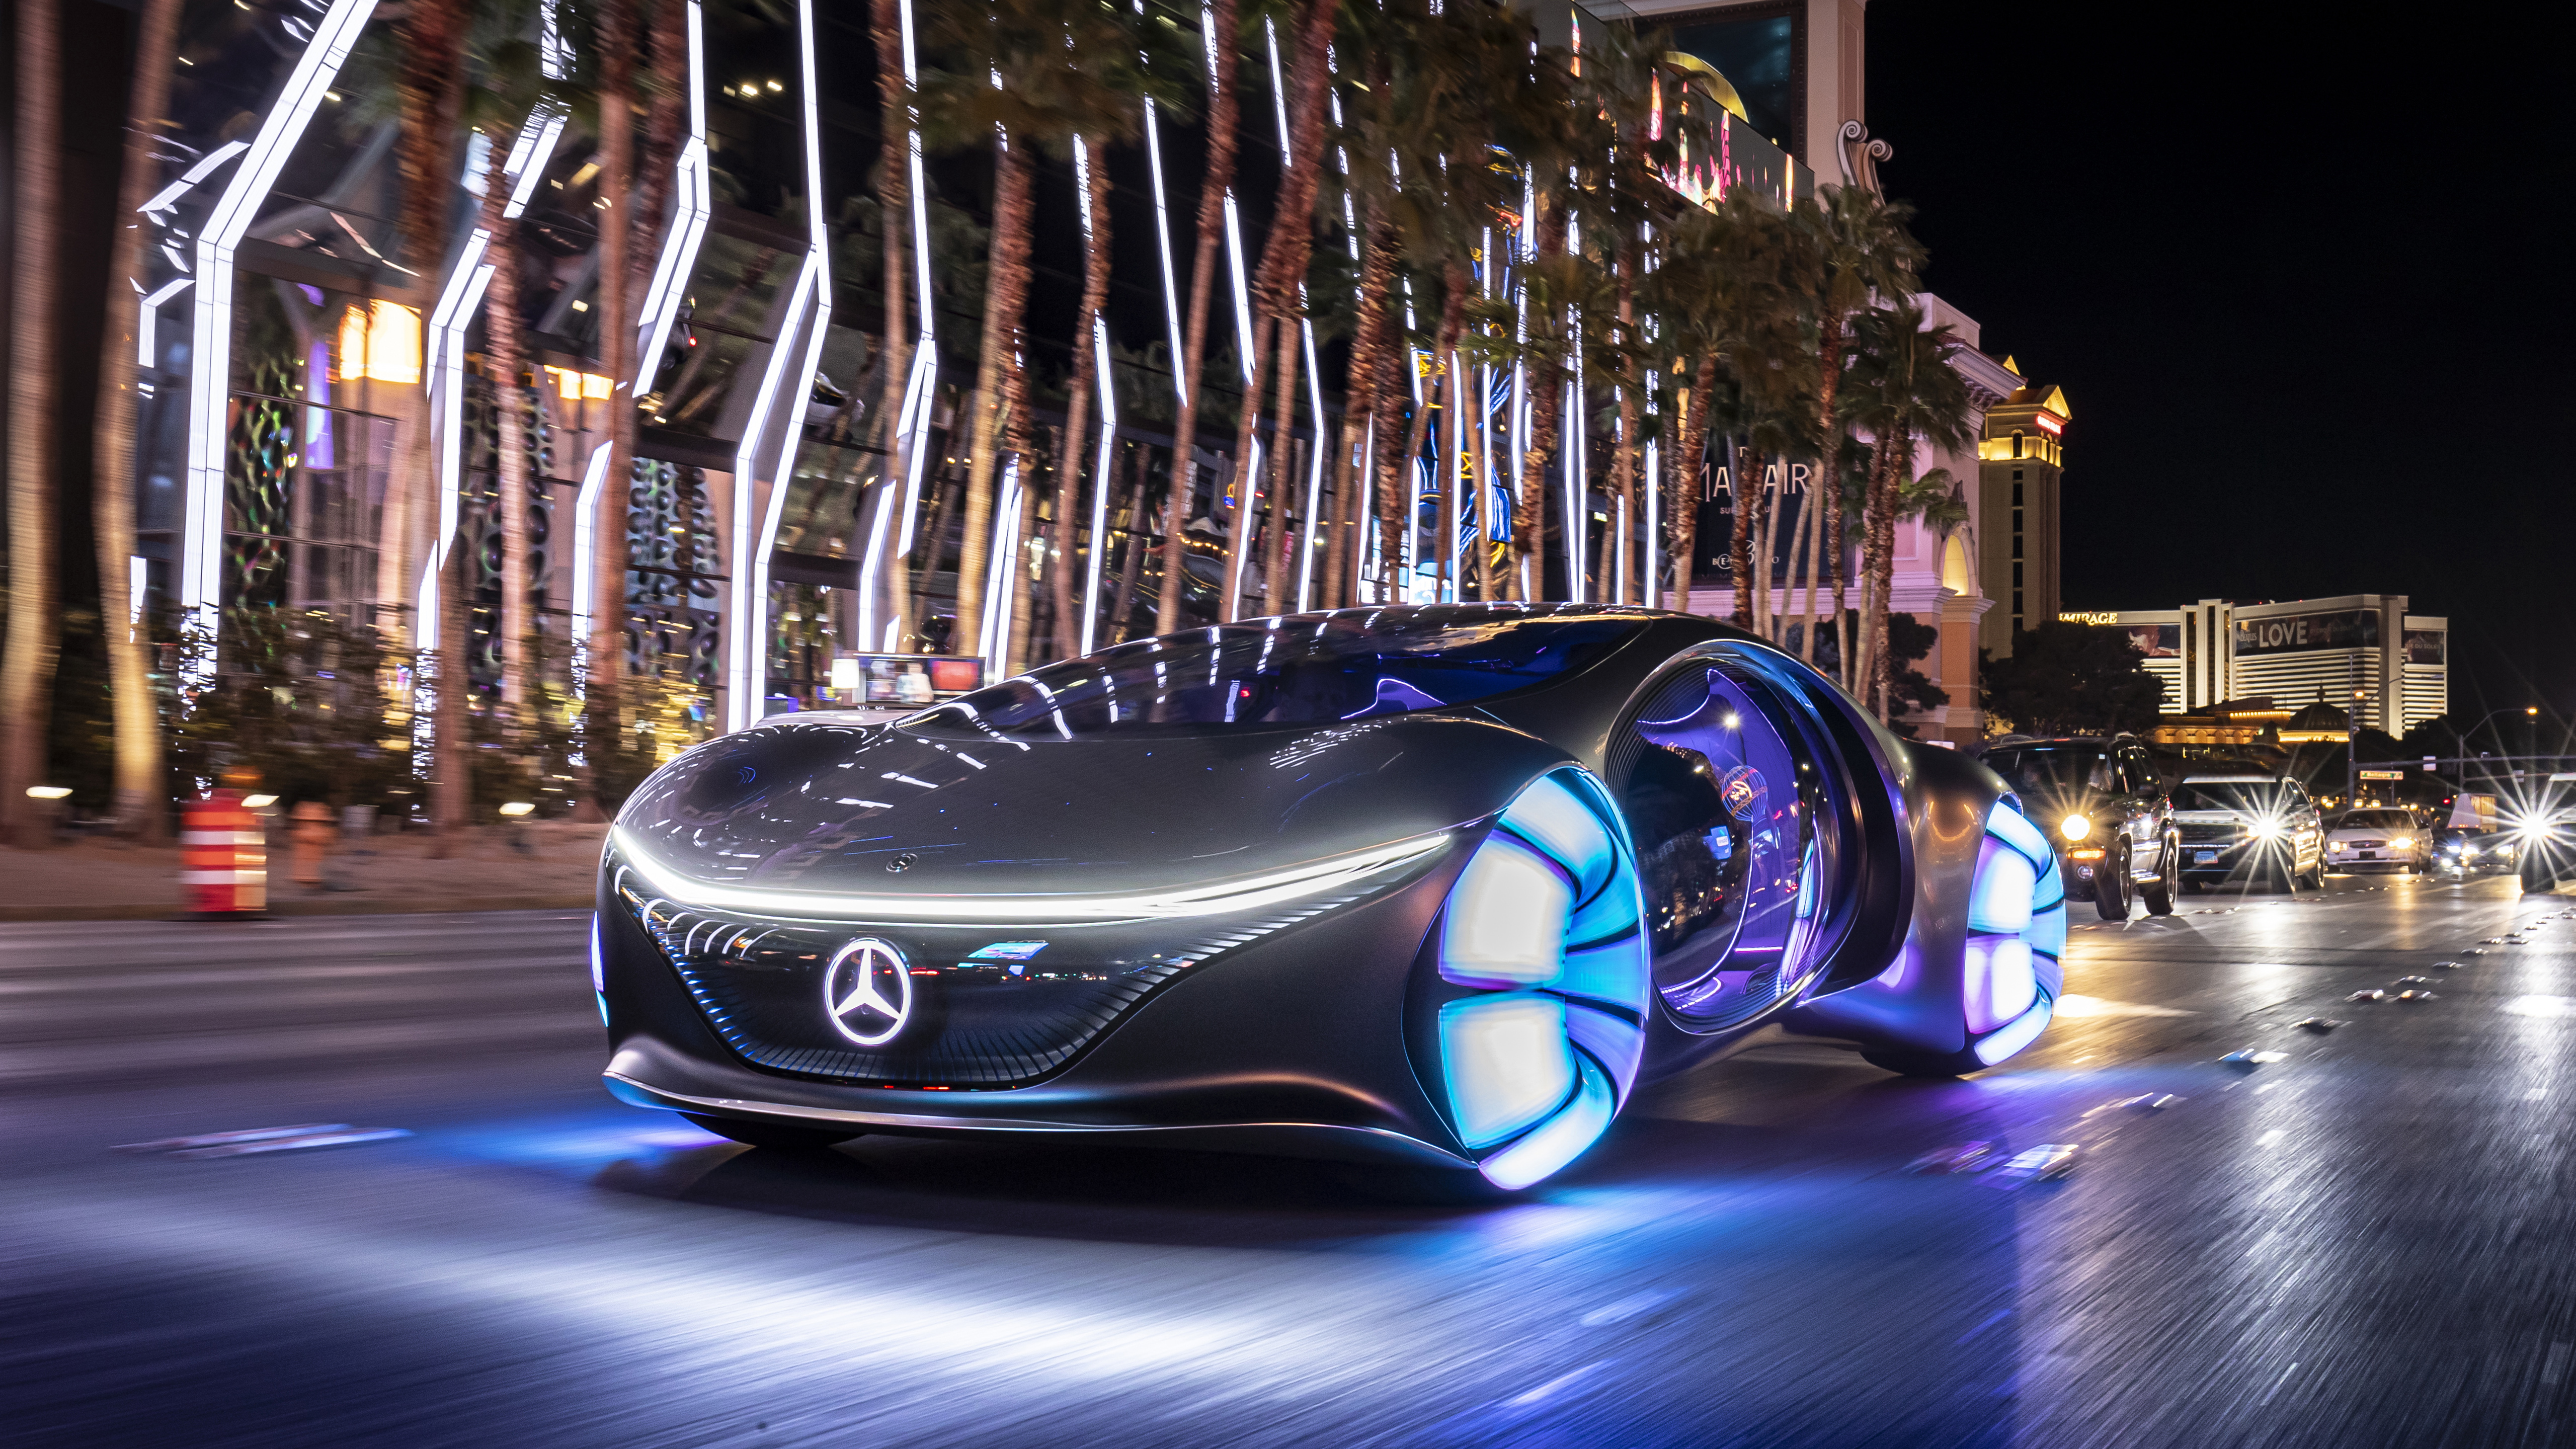 2020 Mercedes-Benz VISION AVTR 5K 5 Wallpaper   HD Car ...